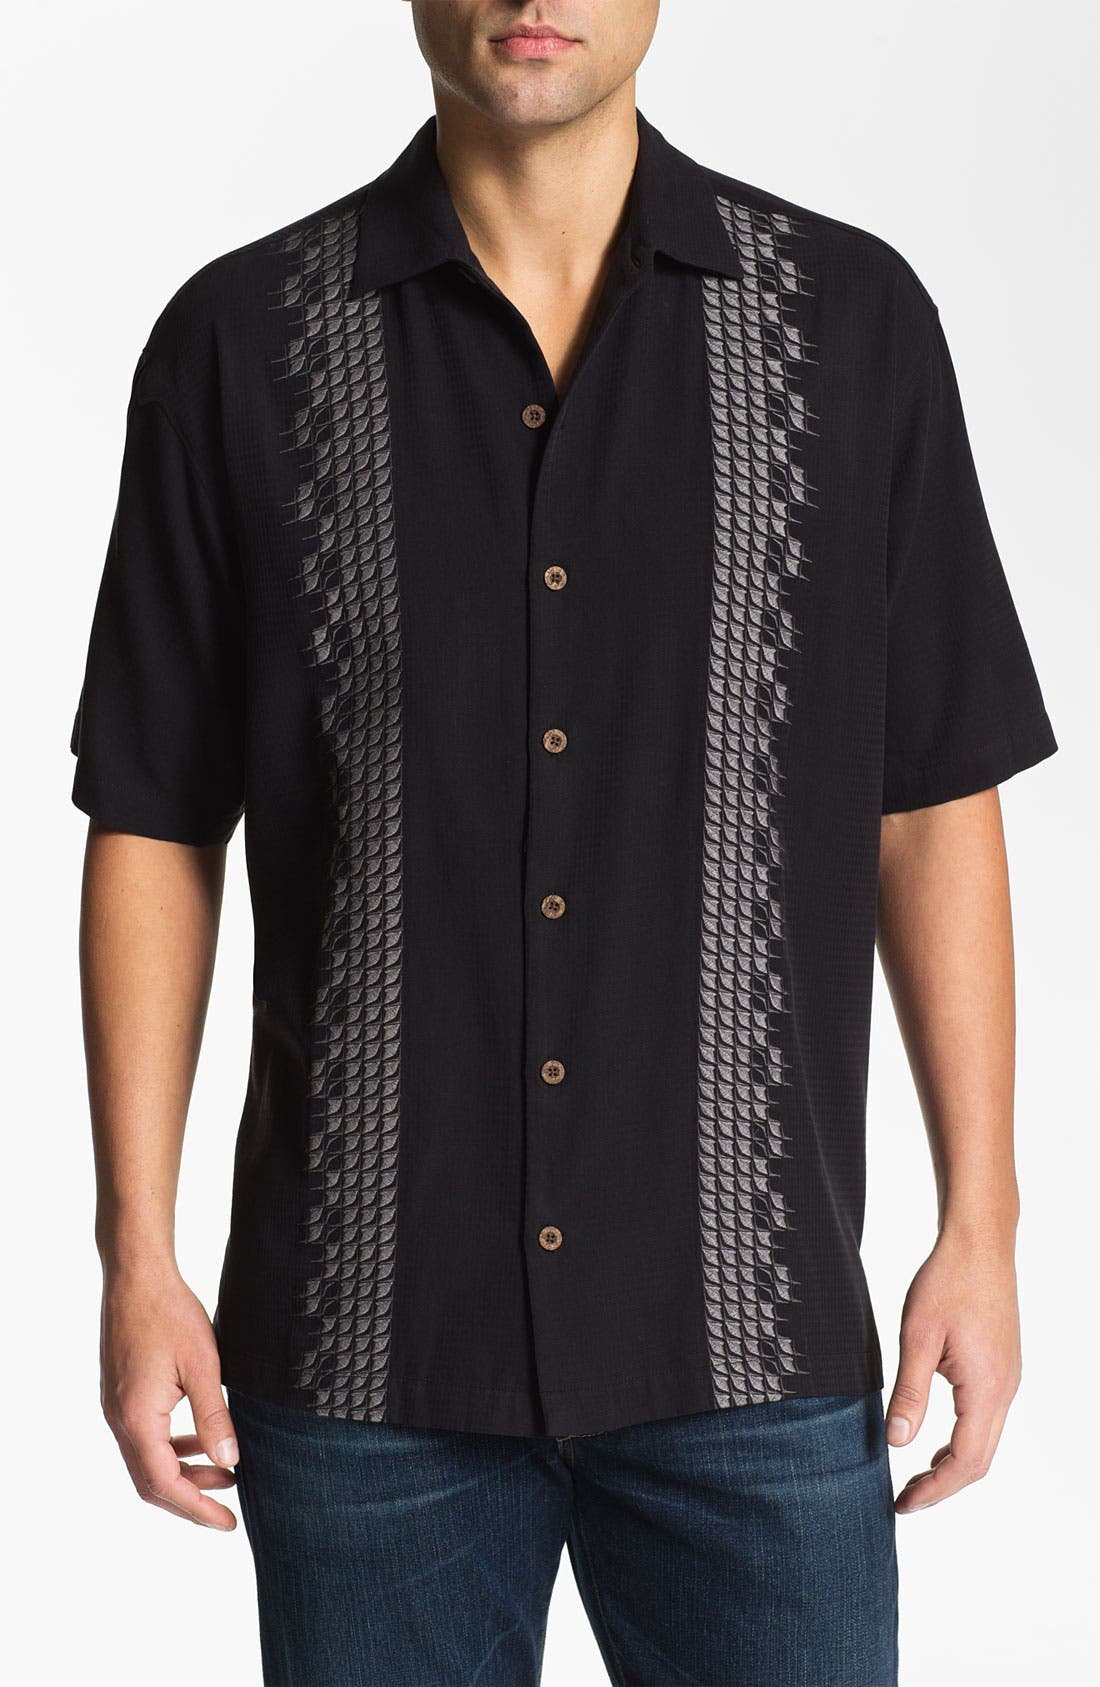 Main Image - Tommy Bahama 'Sand Deco' Silk Campshirt